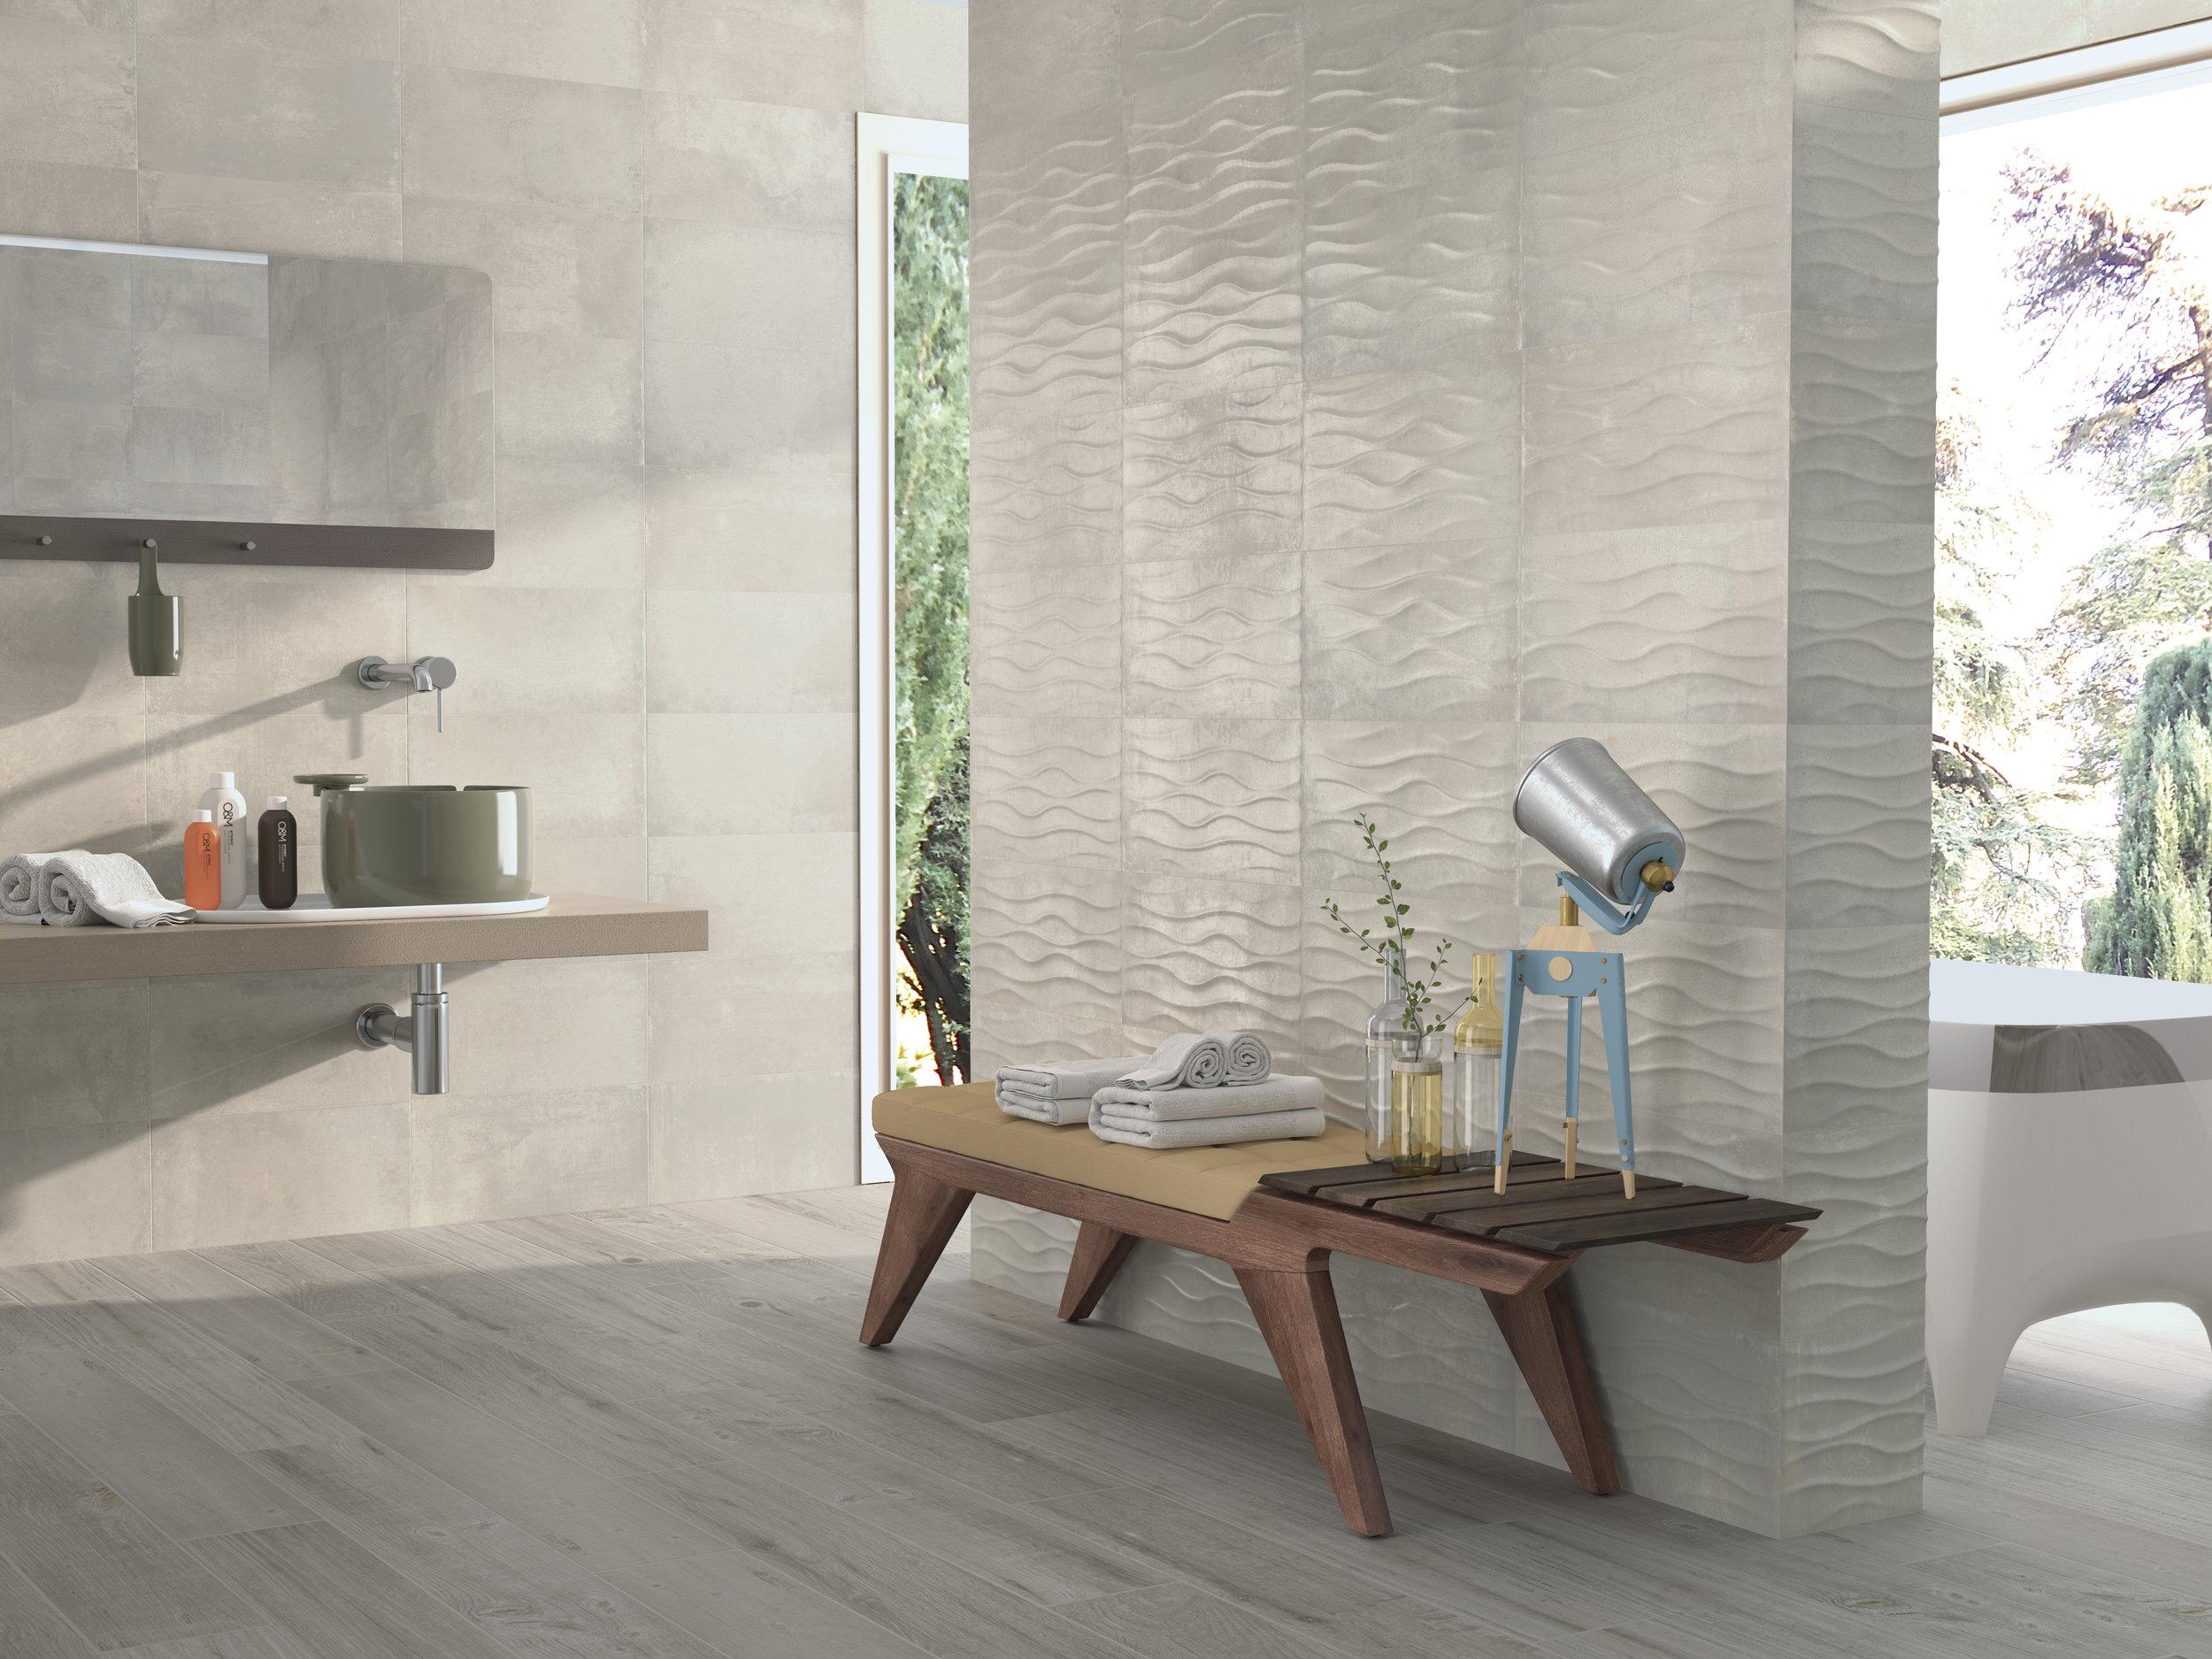 Tivoli Light Grey/Tiara Light Grey 25x50 cm